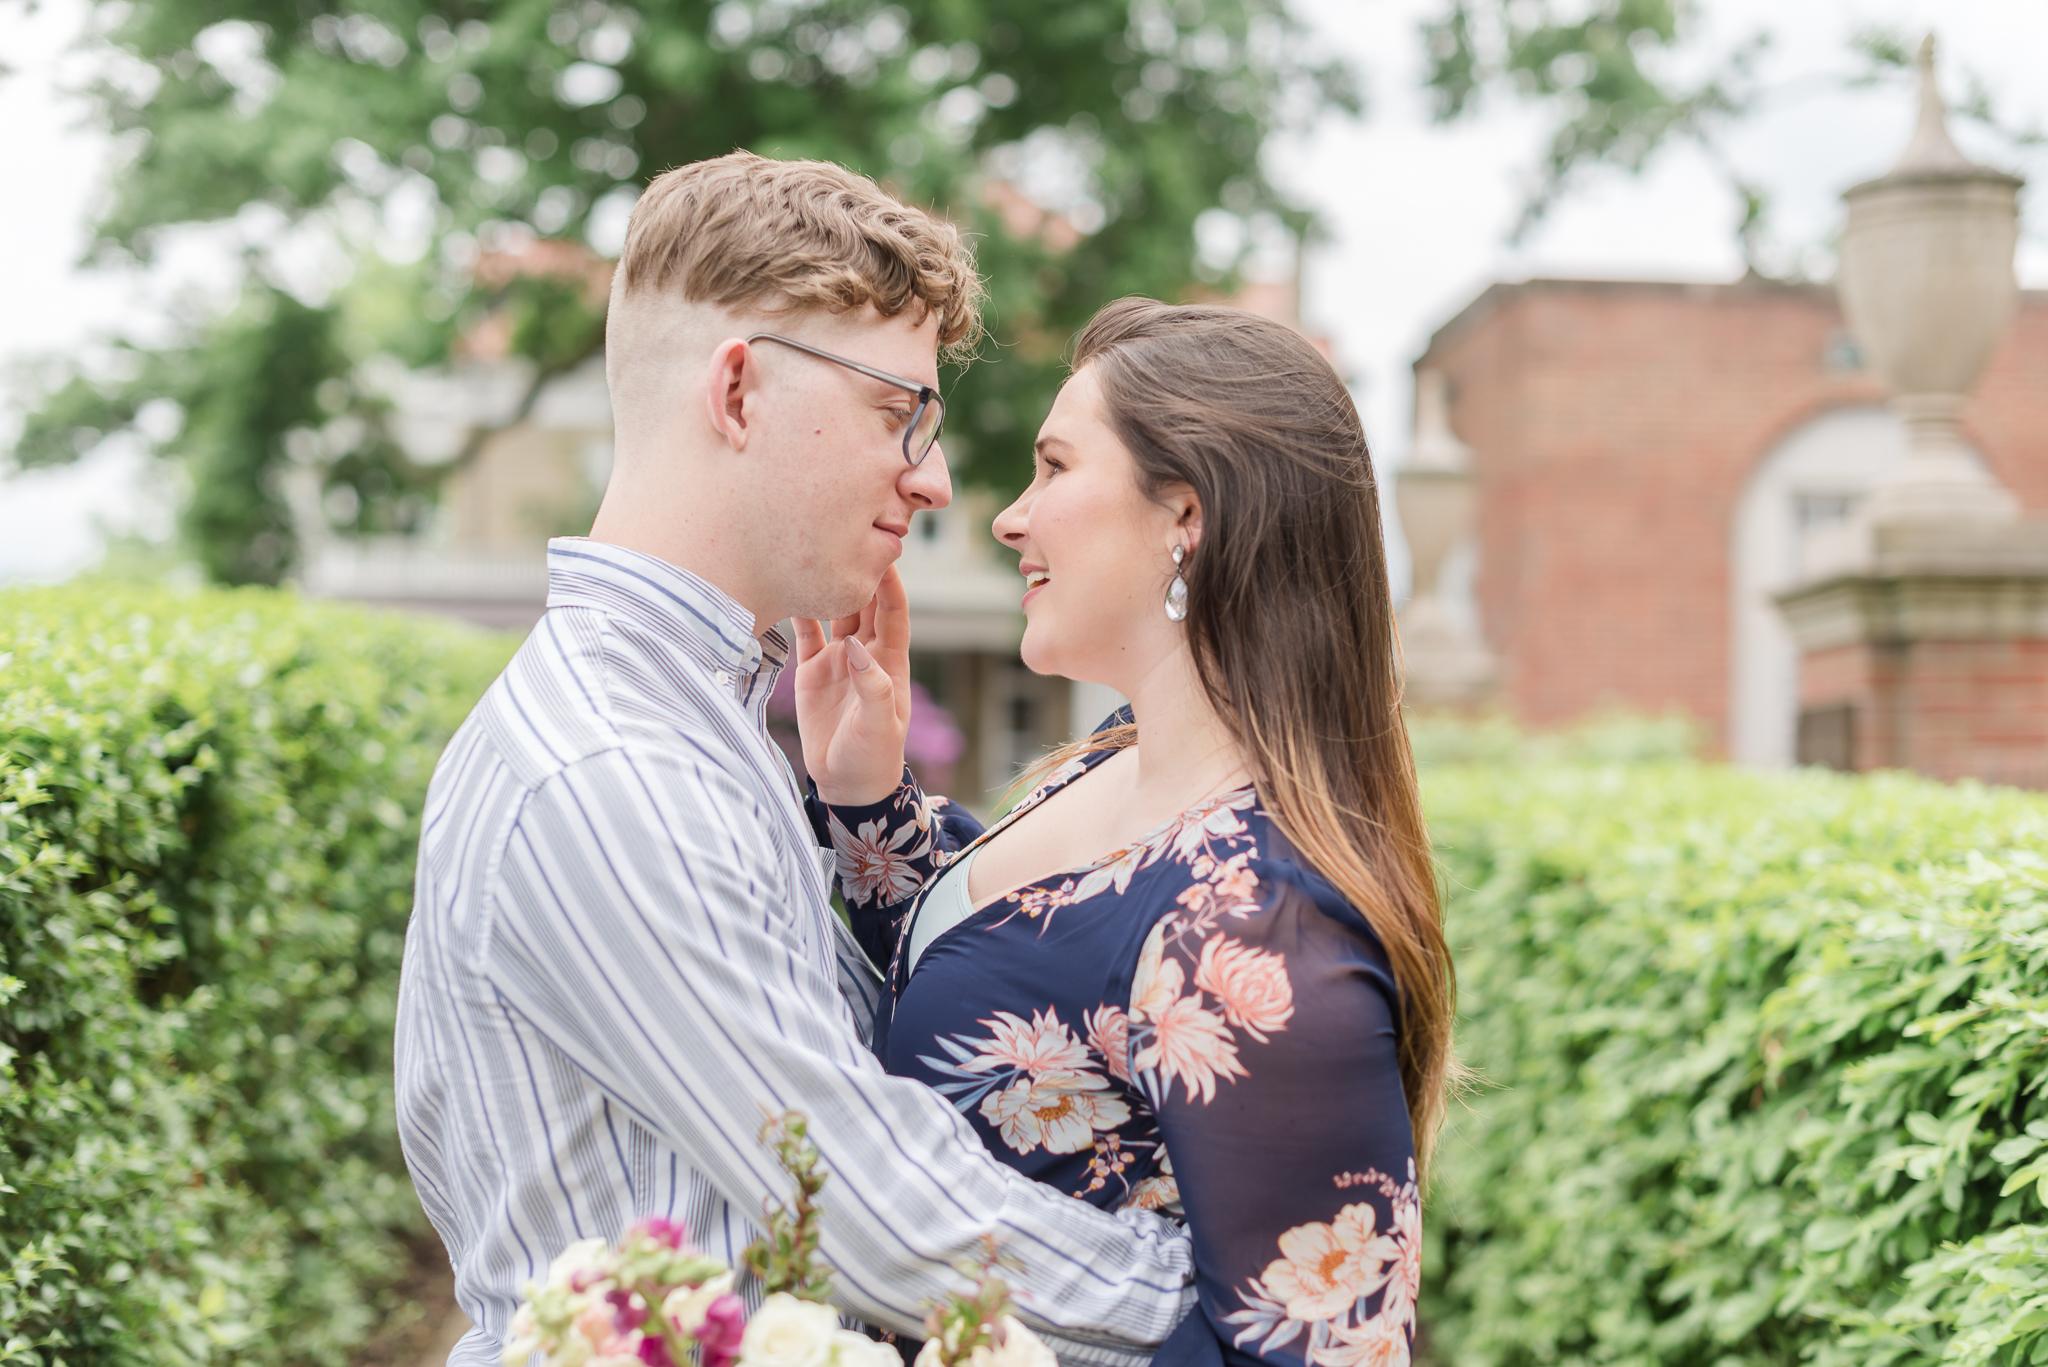 West Virginia University Surprise Proposal During Graduation Ceremony-12.jpg